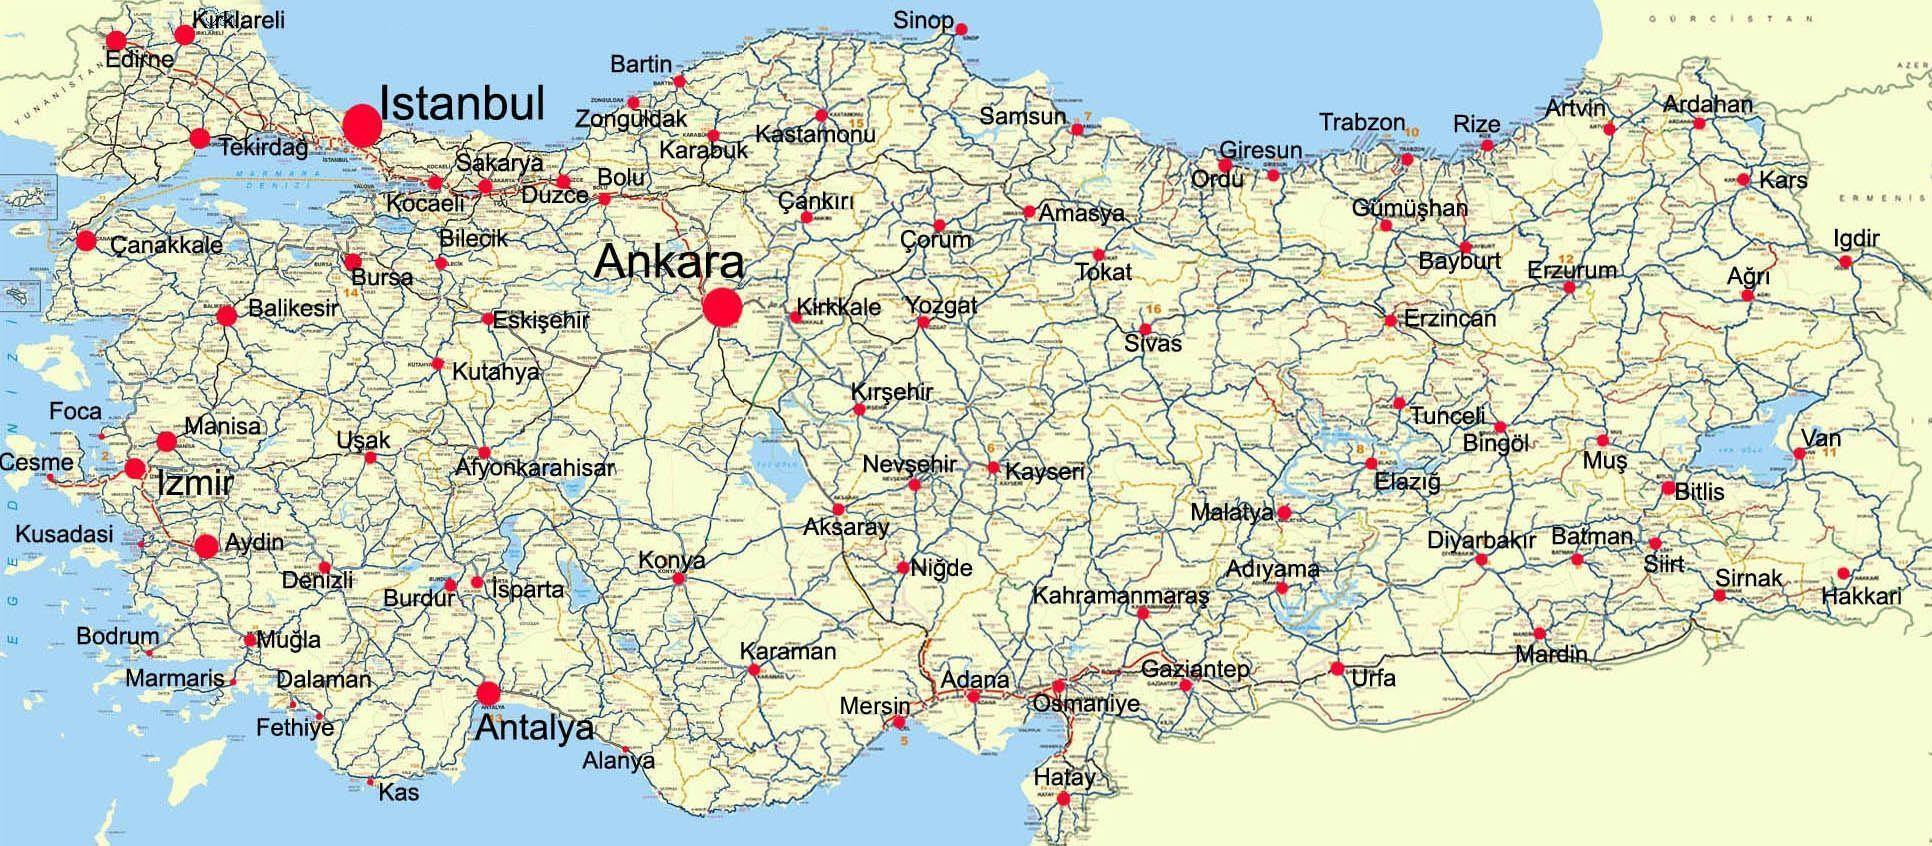 Turecko Mapa Mapy Sveta Turecko Mapa